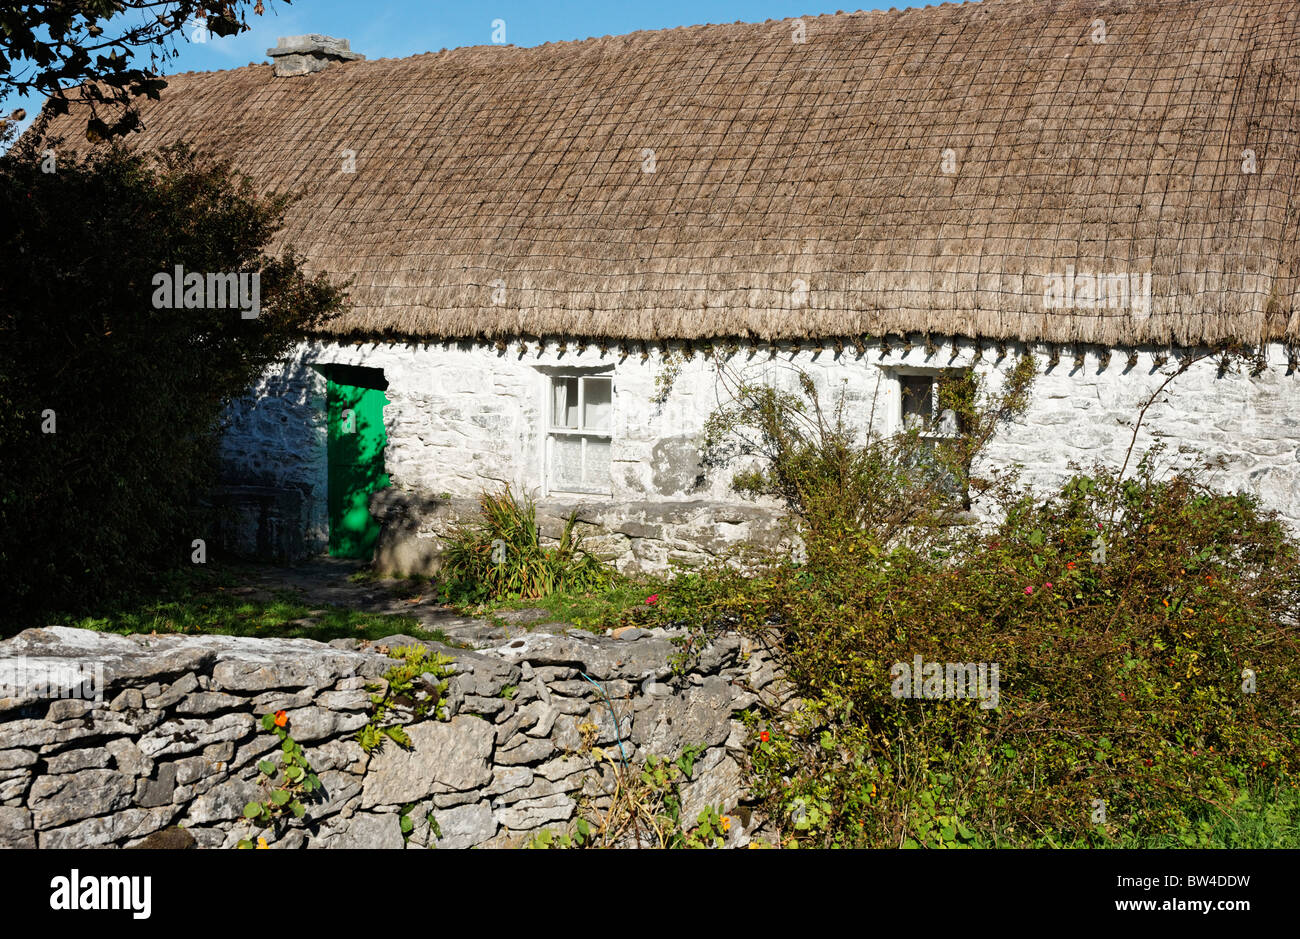 Synge, John Millington Synge Hütte in Carrownlisheen, Inis Meain, Aran-Inseln, County Galway, Connaught, Irland Stockbild